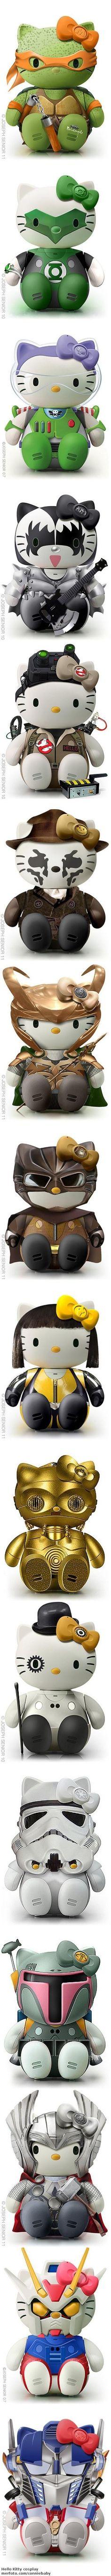 Super hero Hello Kitty by Rocio Bacino